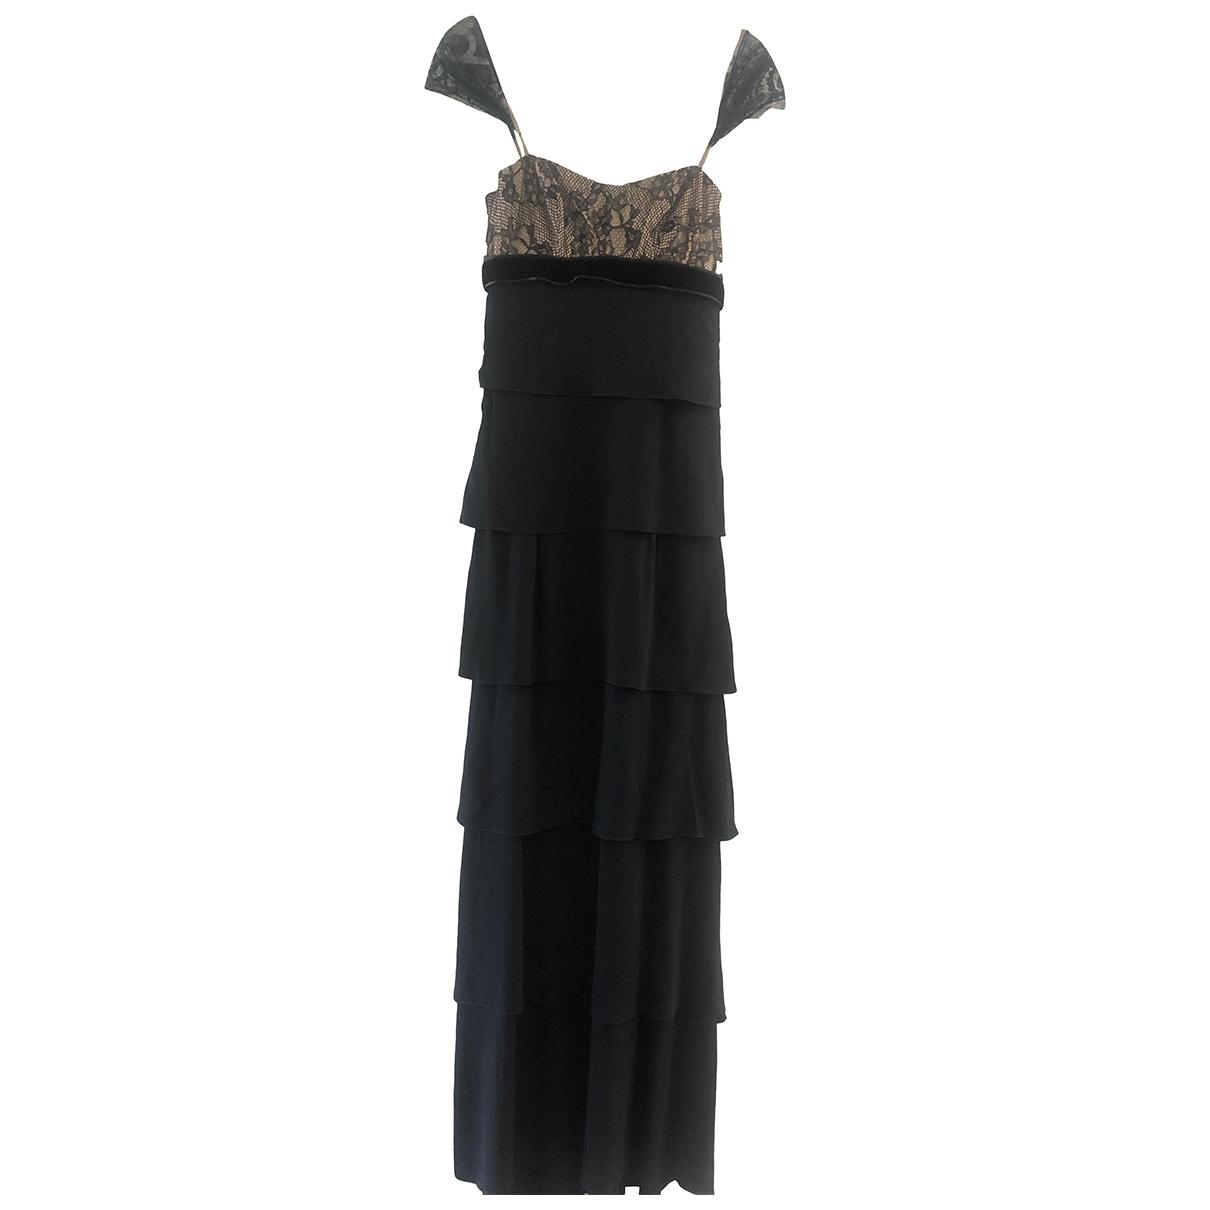 La Perla \N Black dress for Women 42 FR